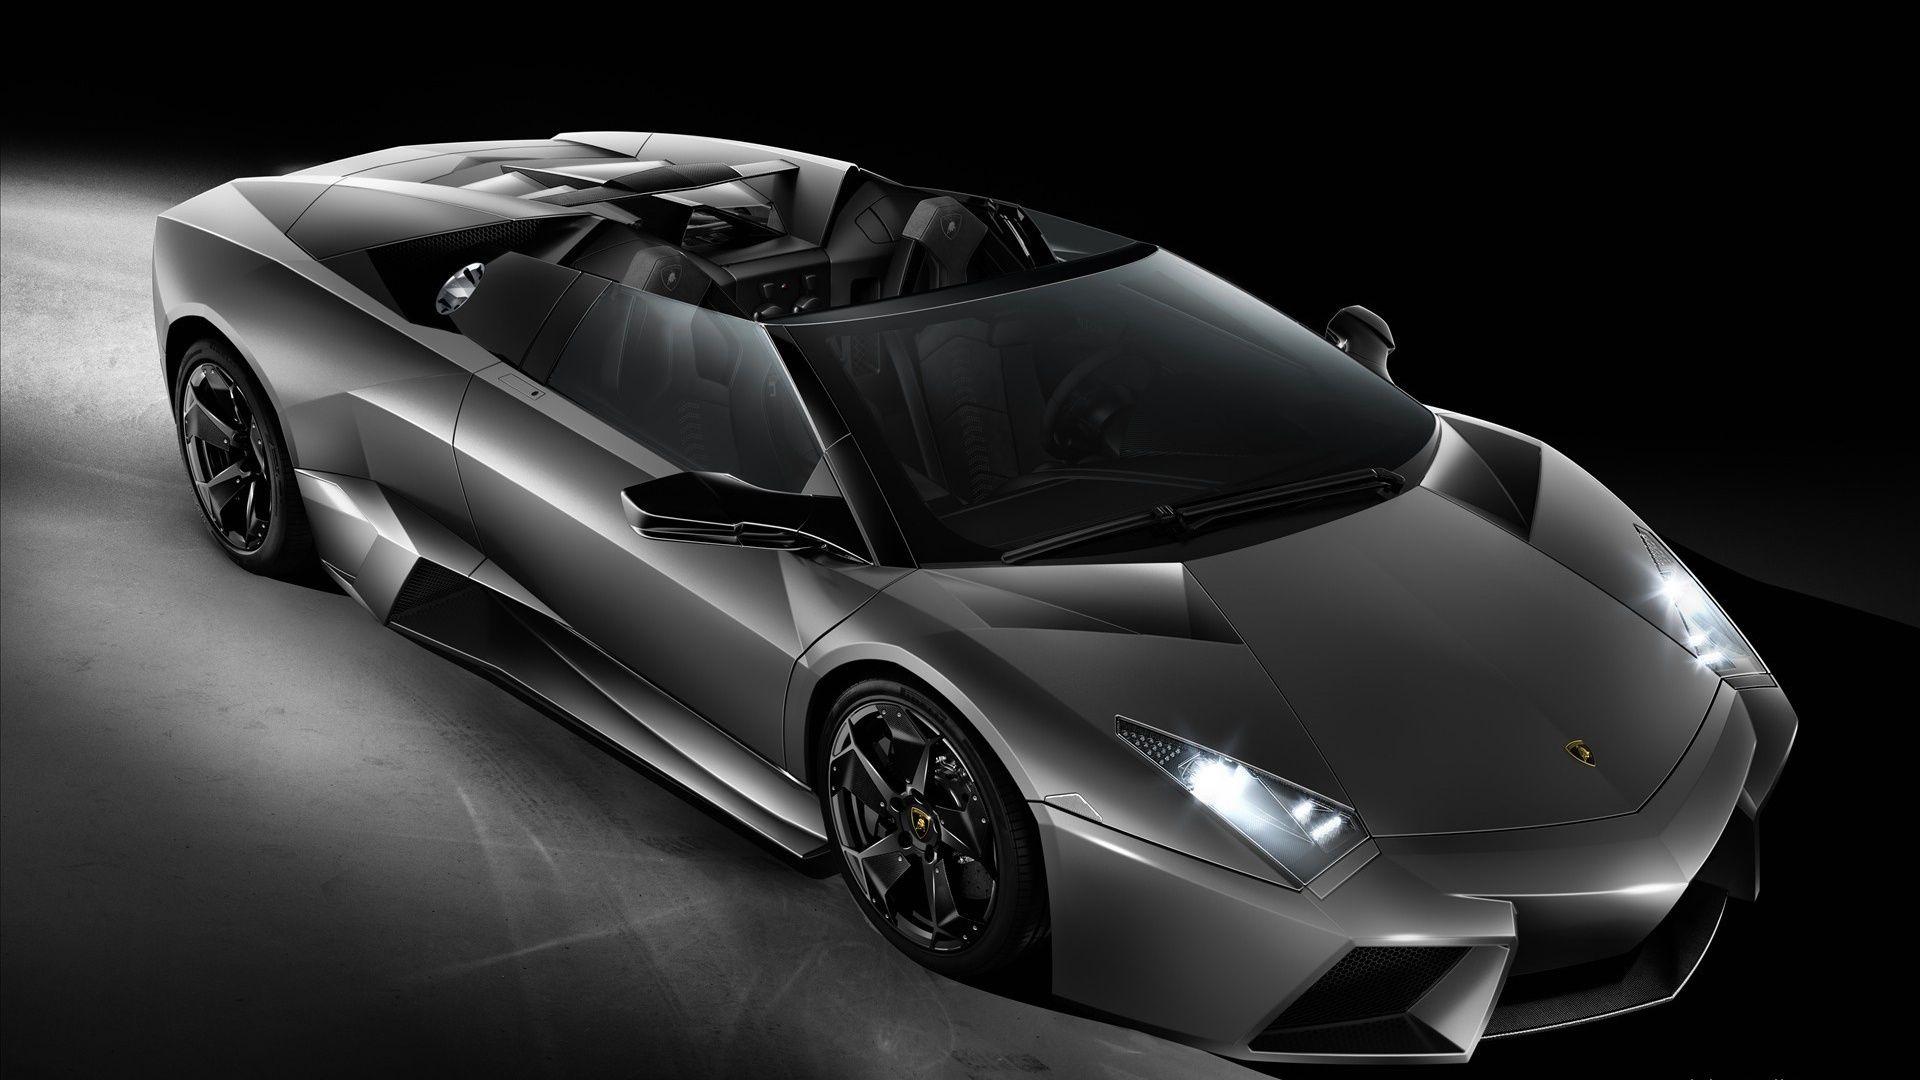 Lamborghini Reventon Wallpaper HD Dekstop